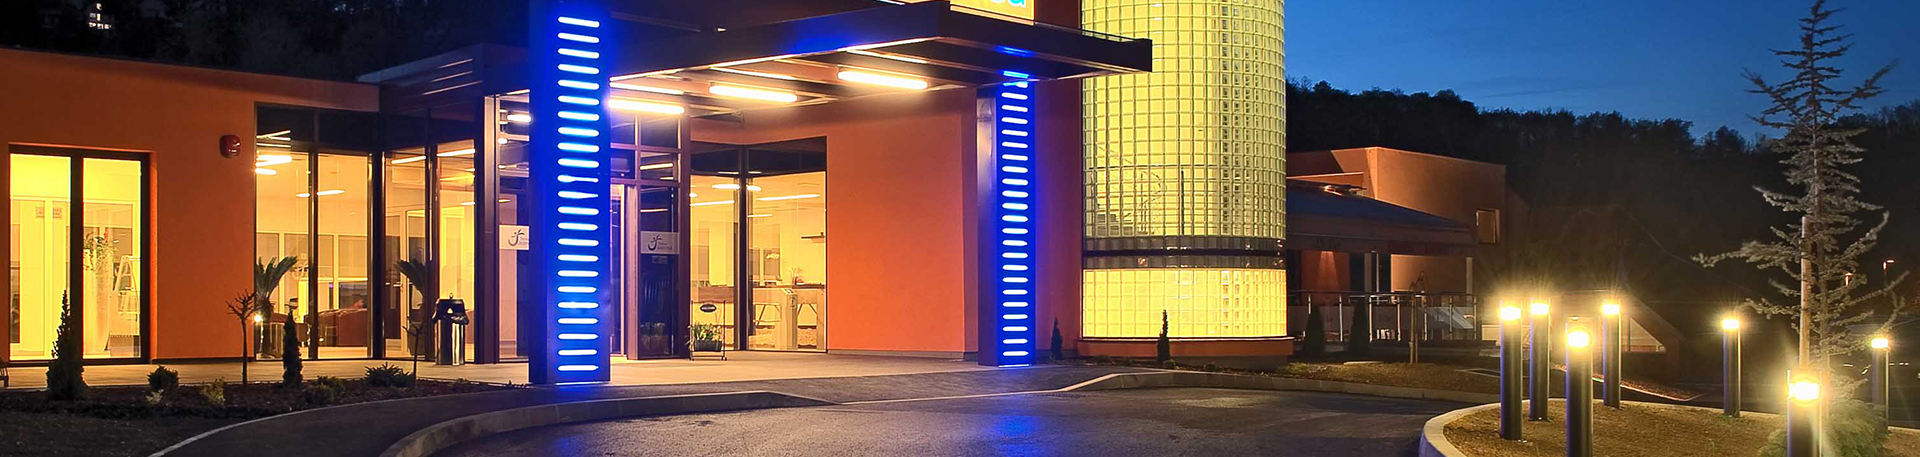 hotel_main1